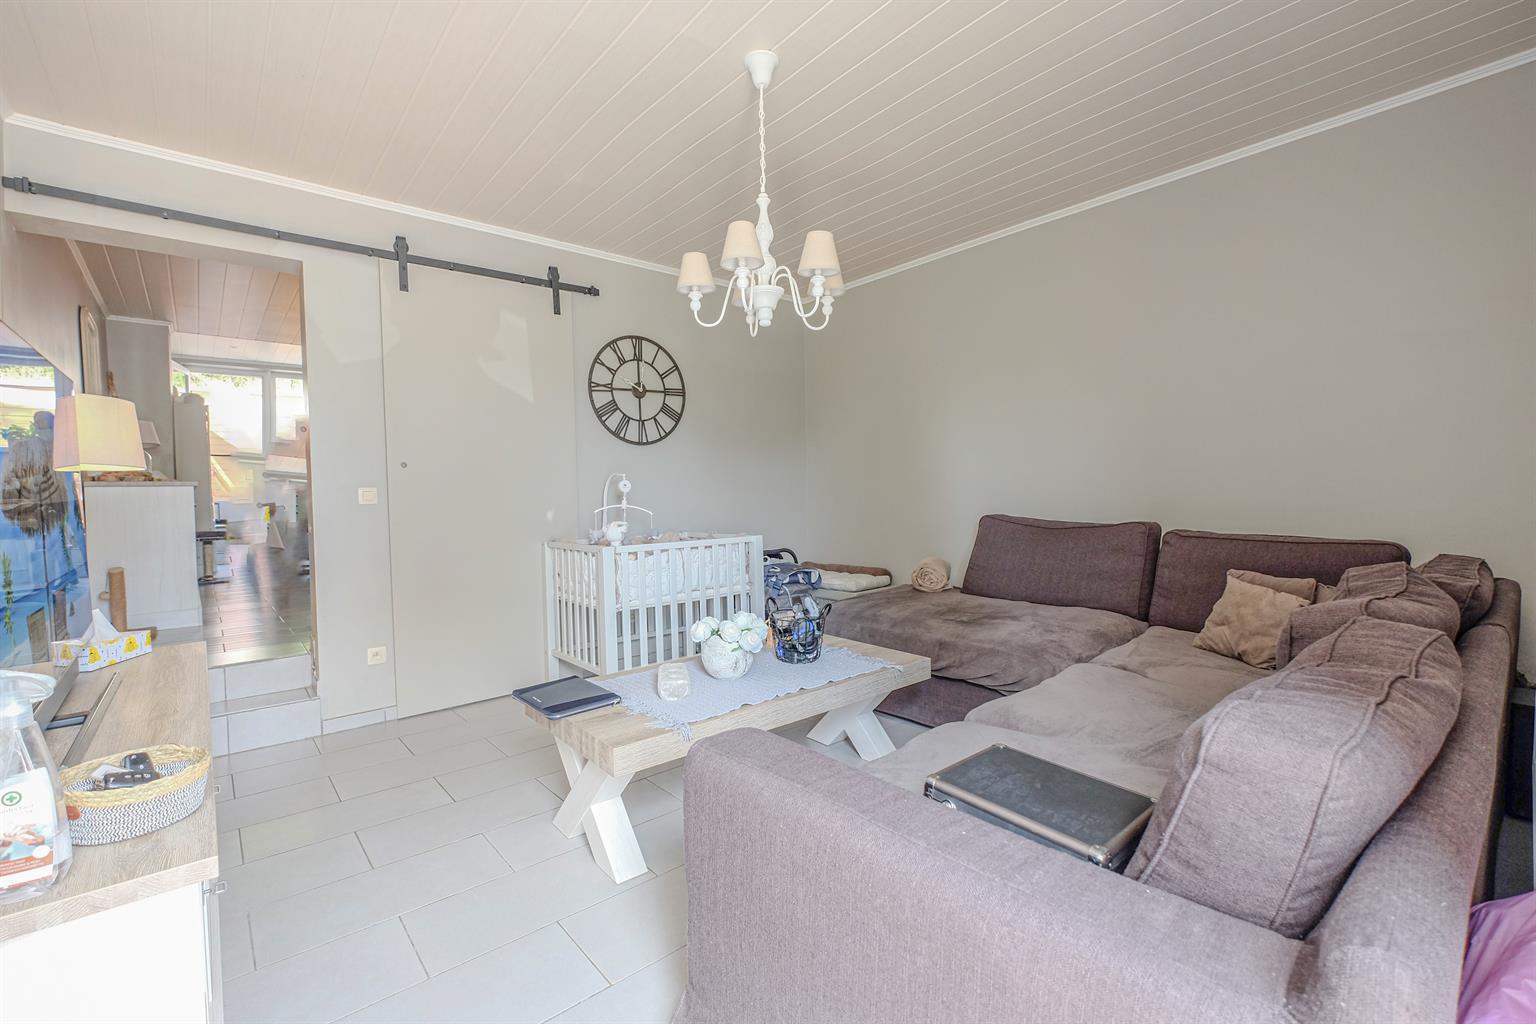 Maison - Rebecq - #4519025-2